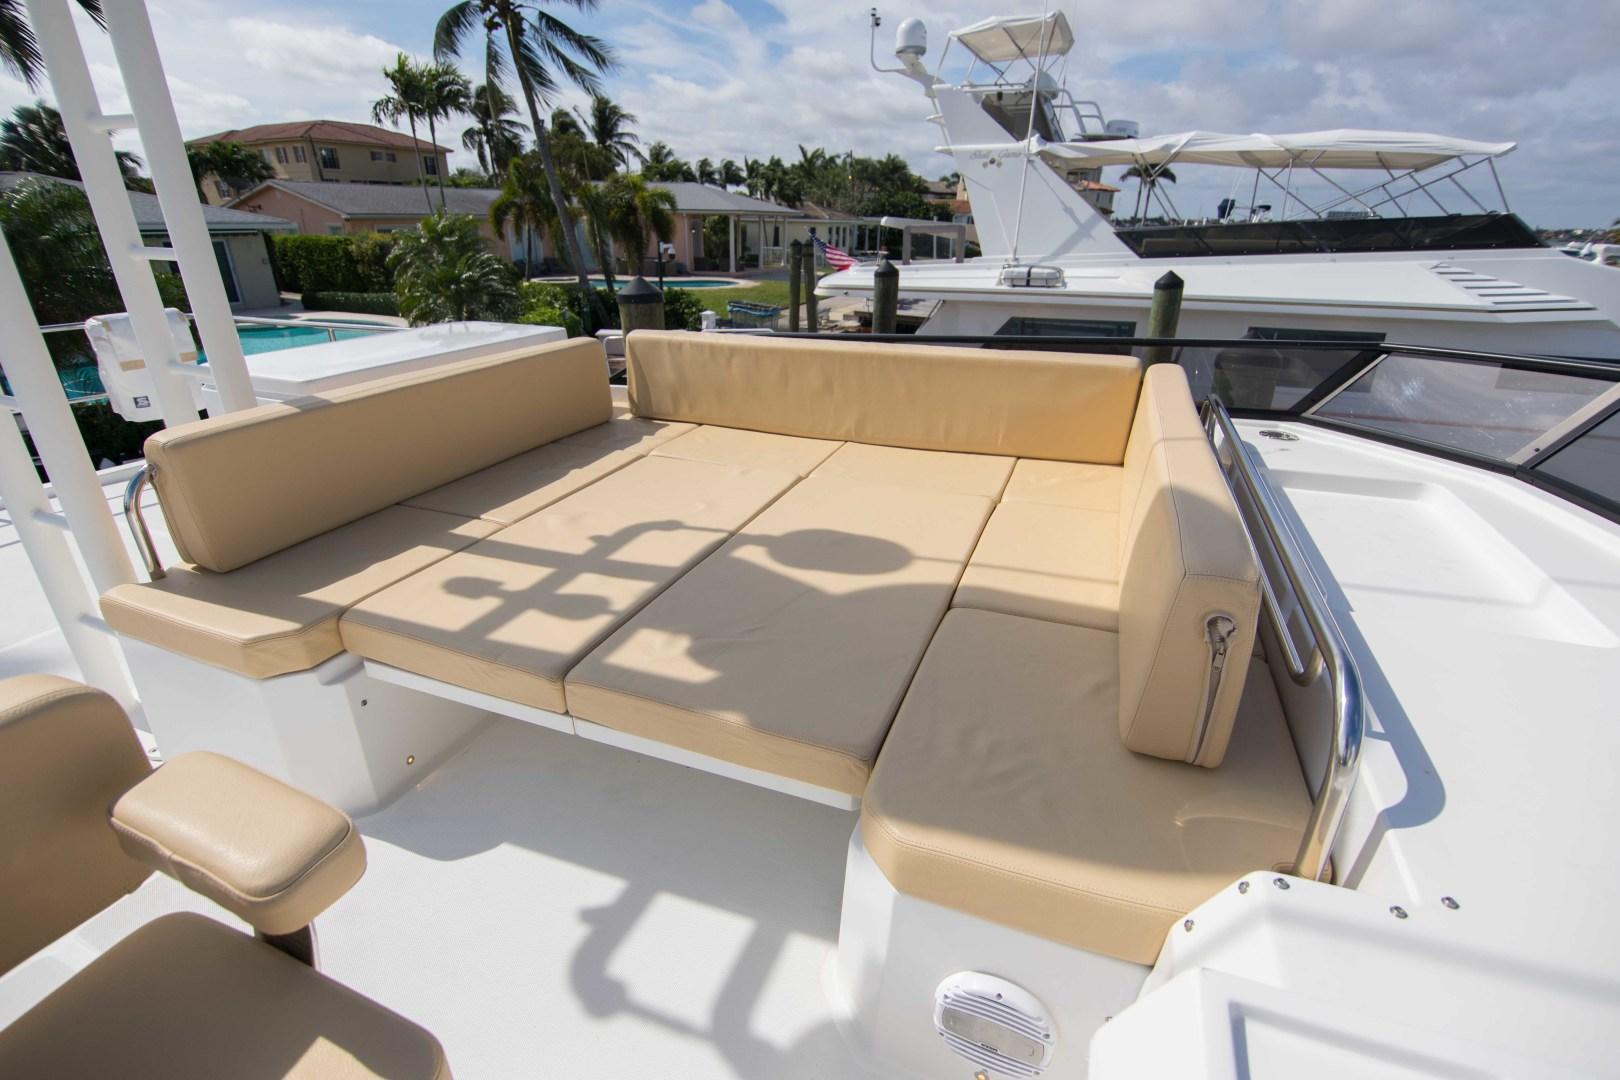 Sundeck-58 Sport 2019-LJ IV Singer Island-Florida-United States-Flybridge-1373089 | Thumbnail